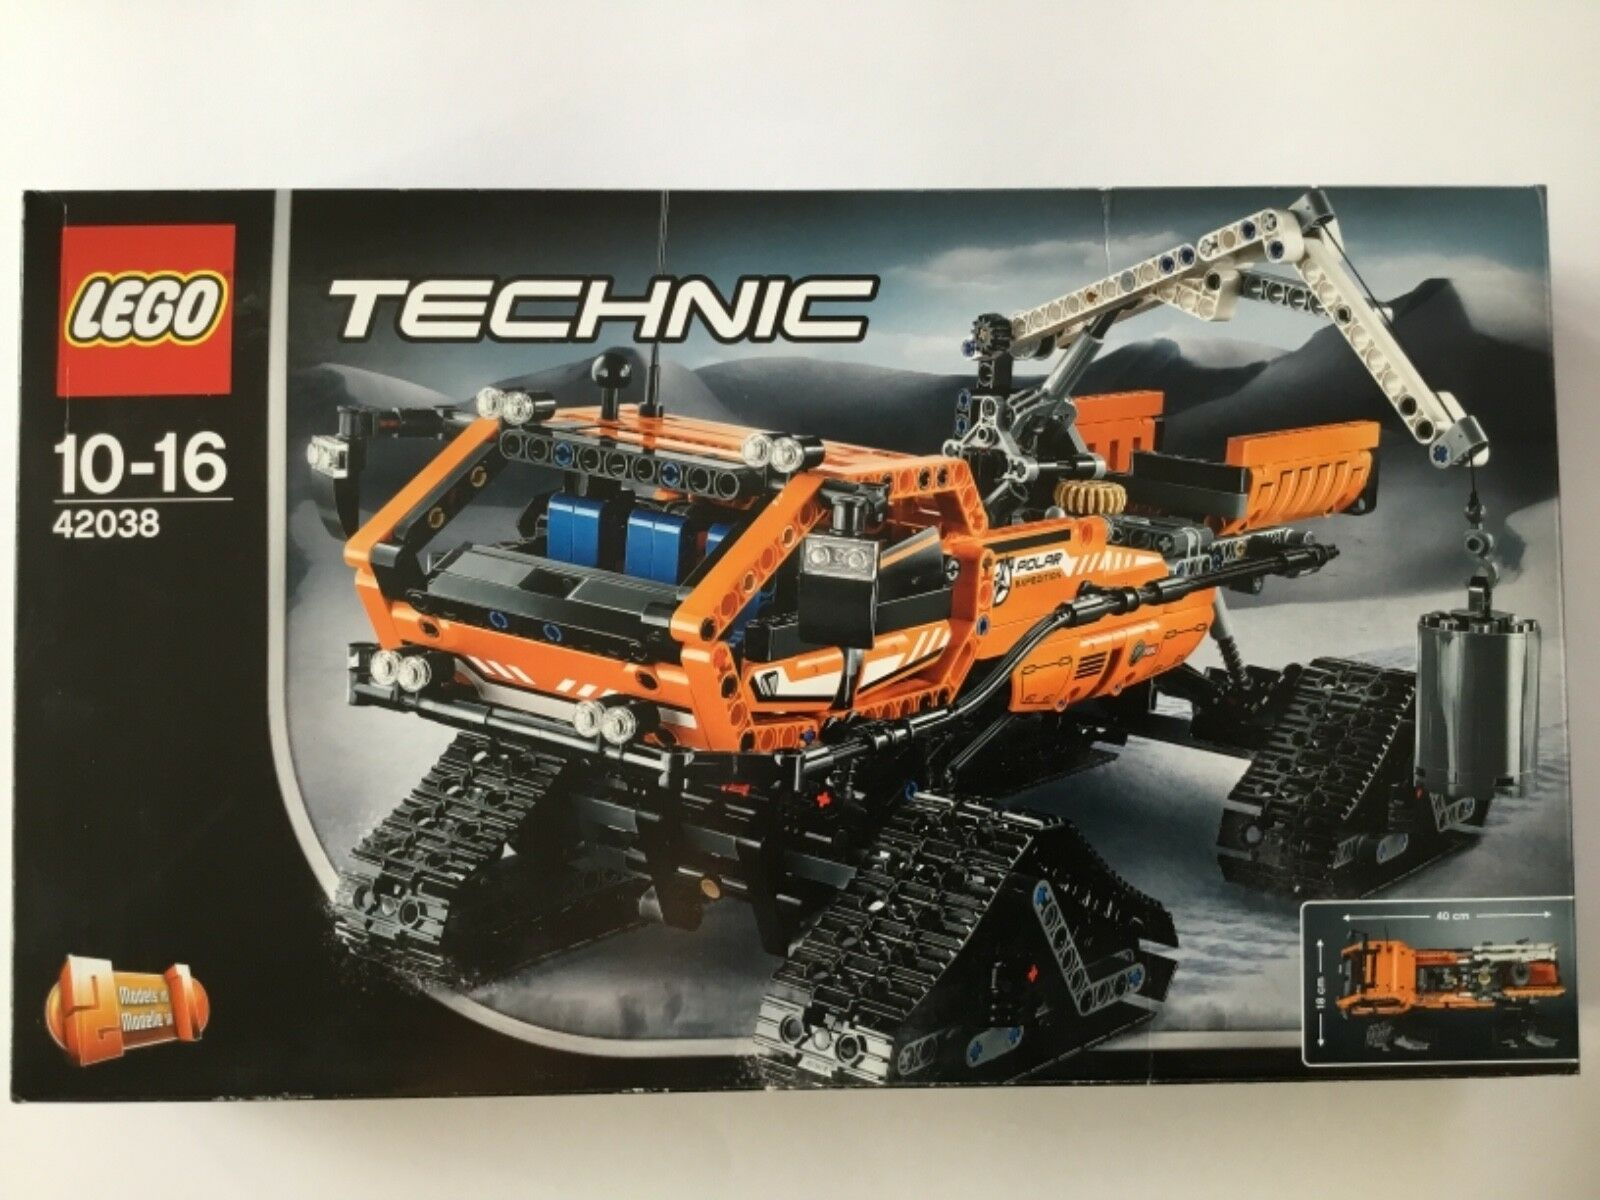 LEGO Technic 42038 - Arktis-Kettenfahrzeug - NEU OVP - Karton hat Knicke